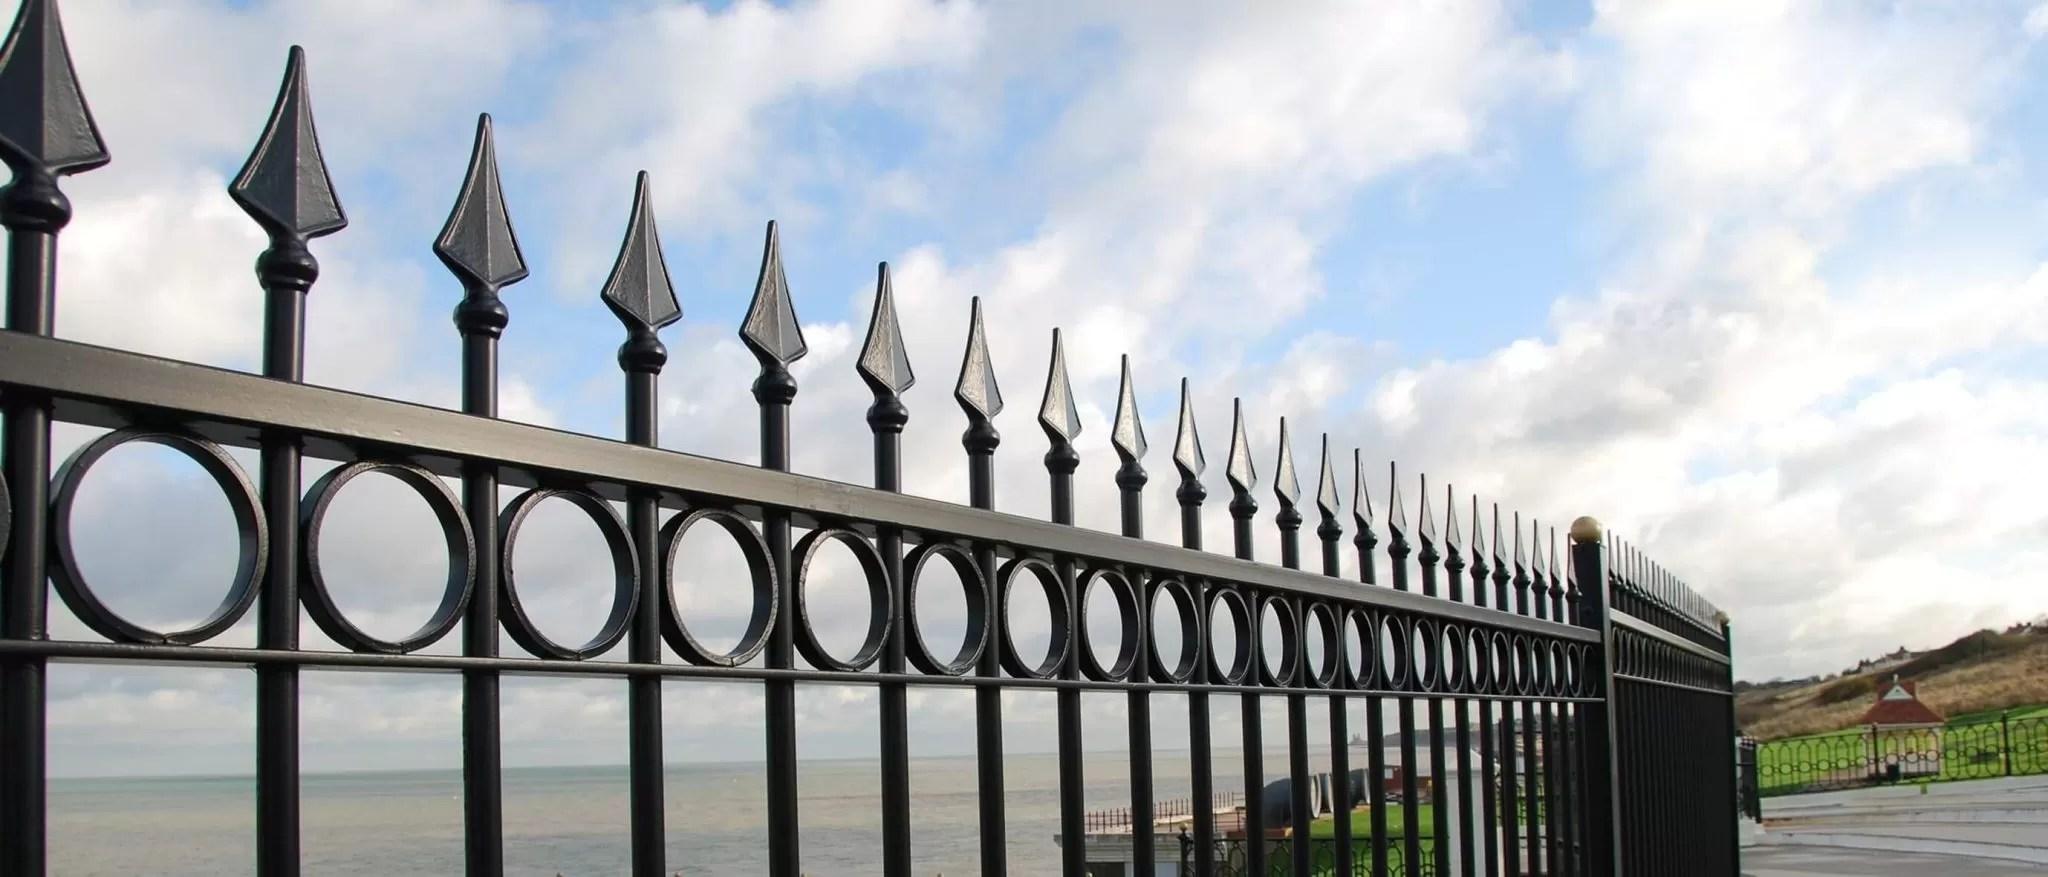 Gates & Grilles Fence